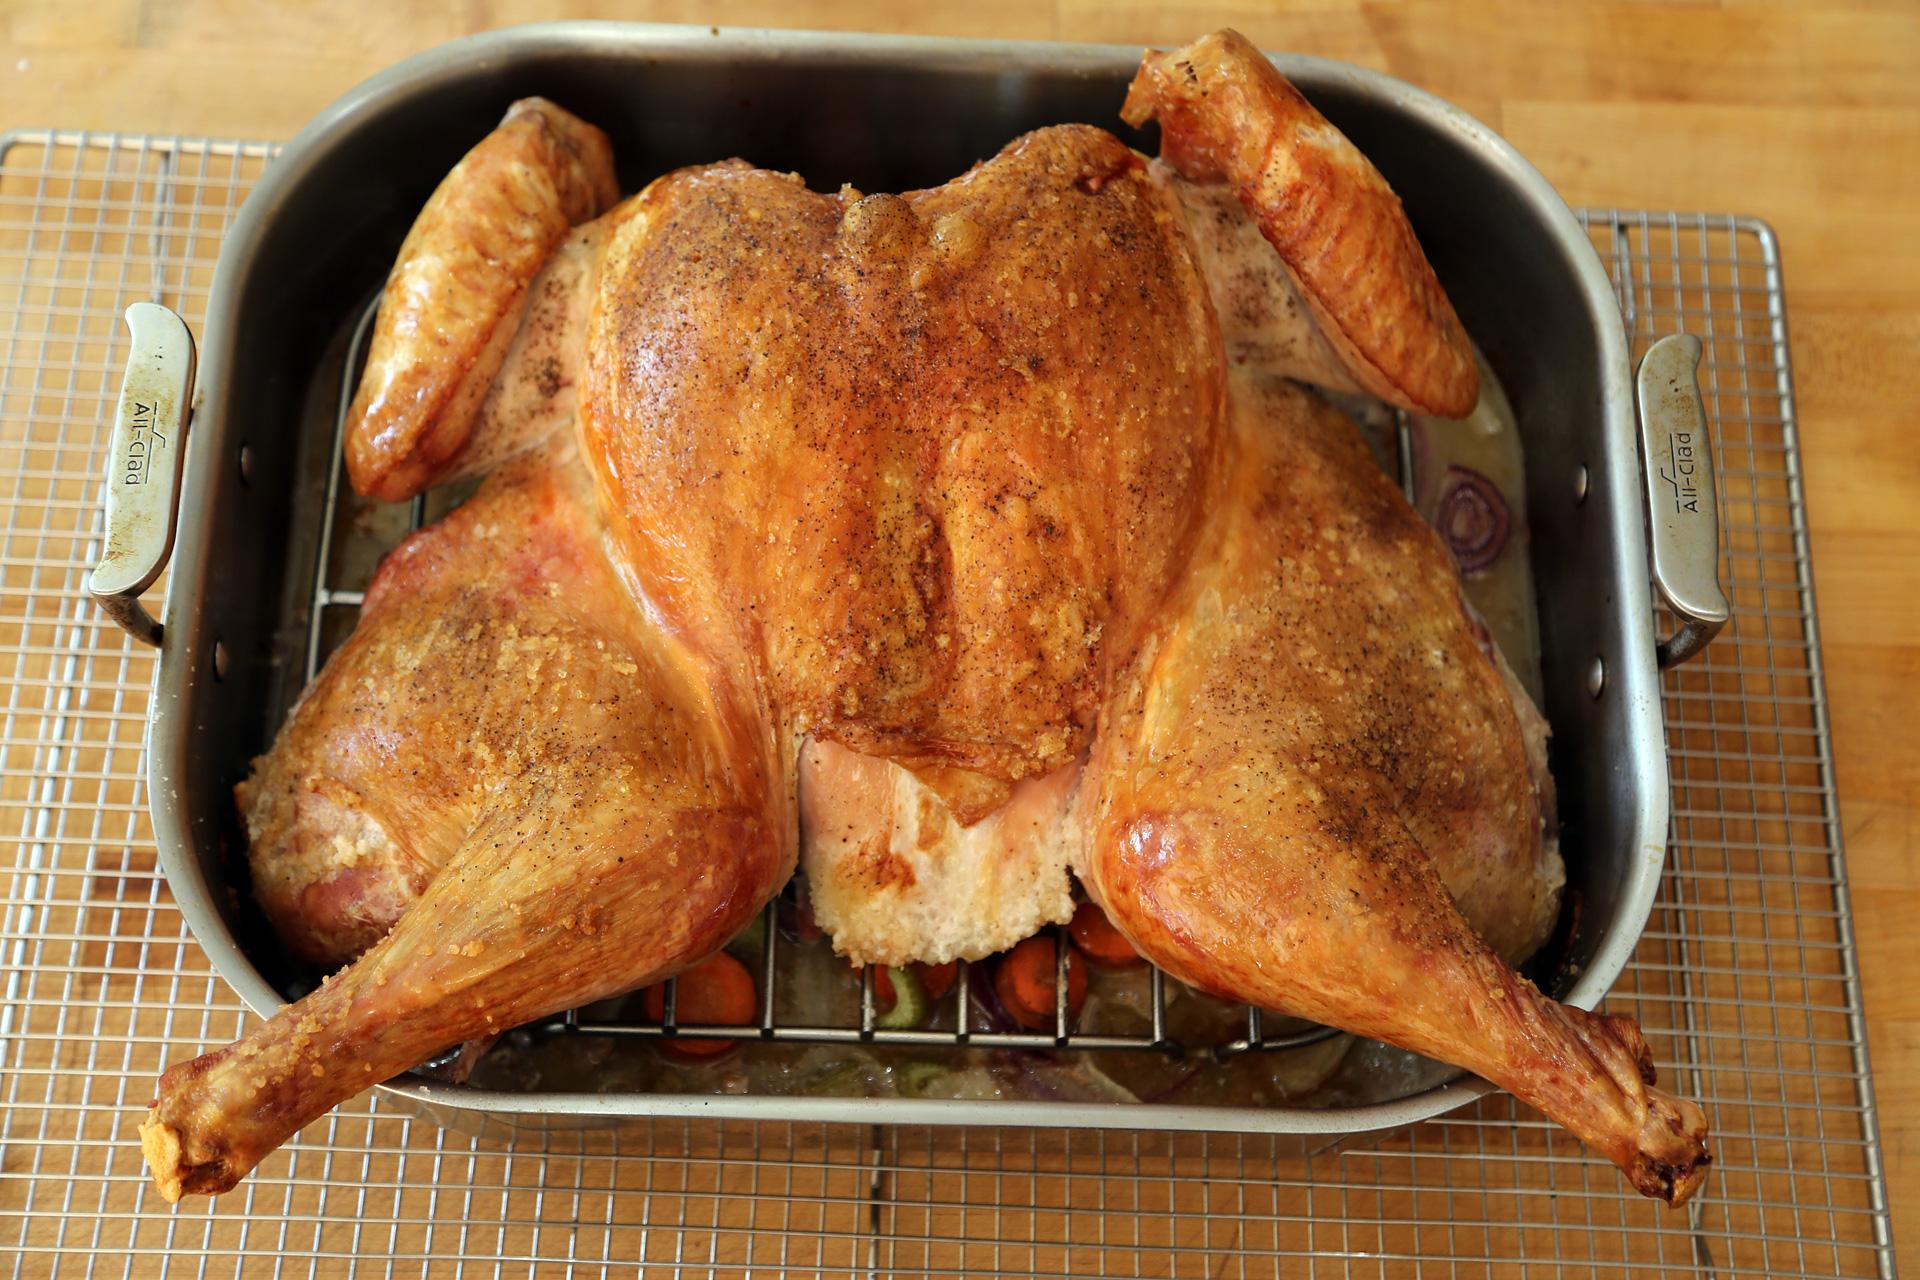 Spatchcocked Roast Turkey in roasting pan